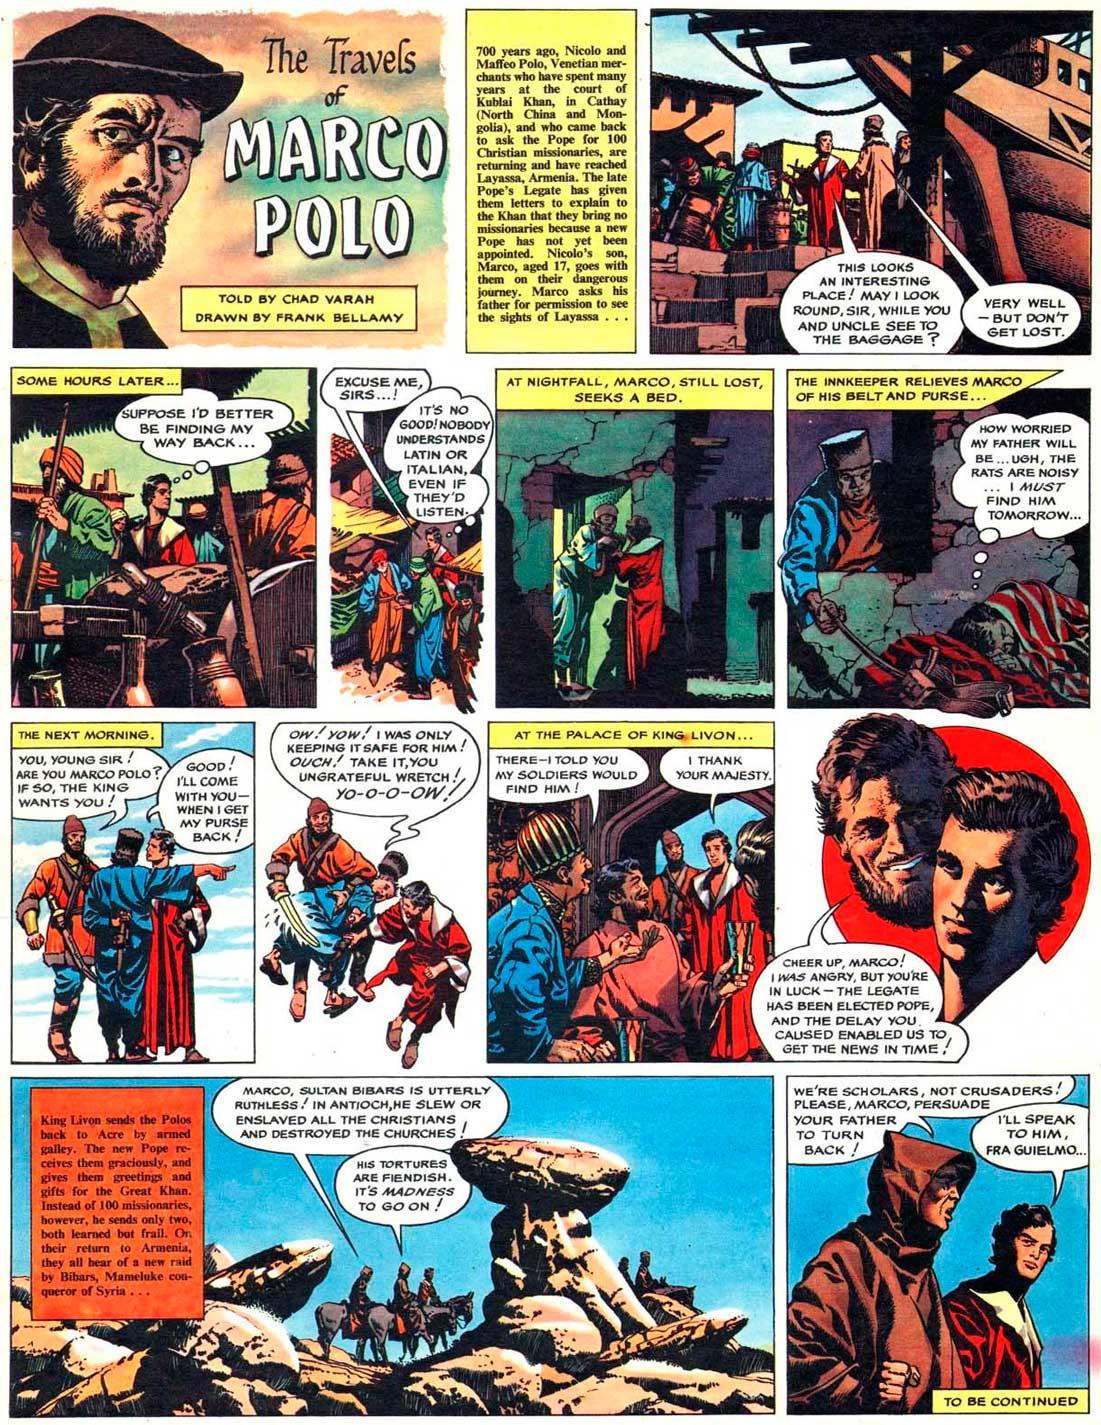 British Comic Art: Marco polo